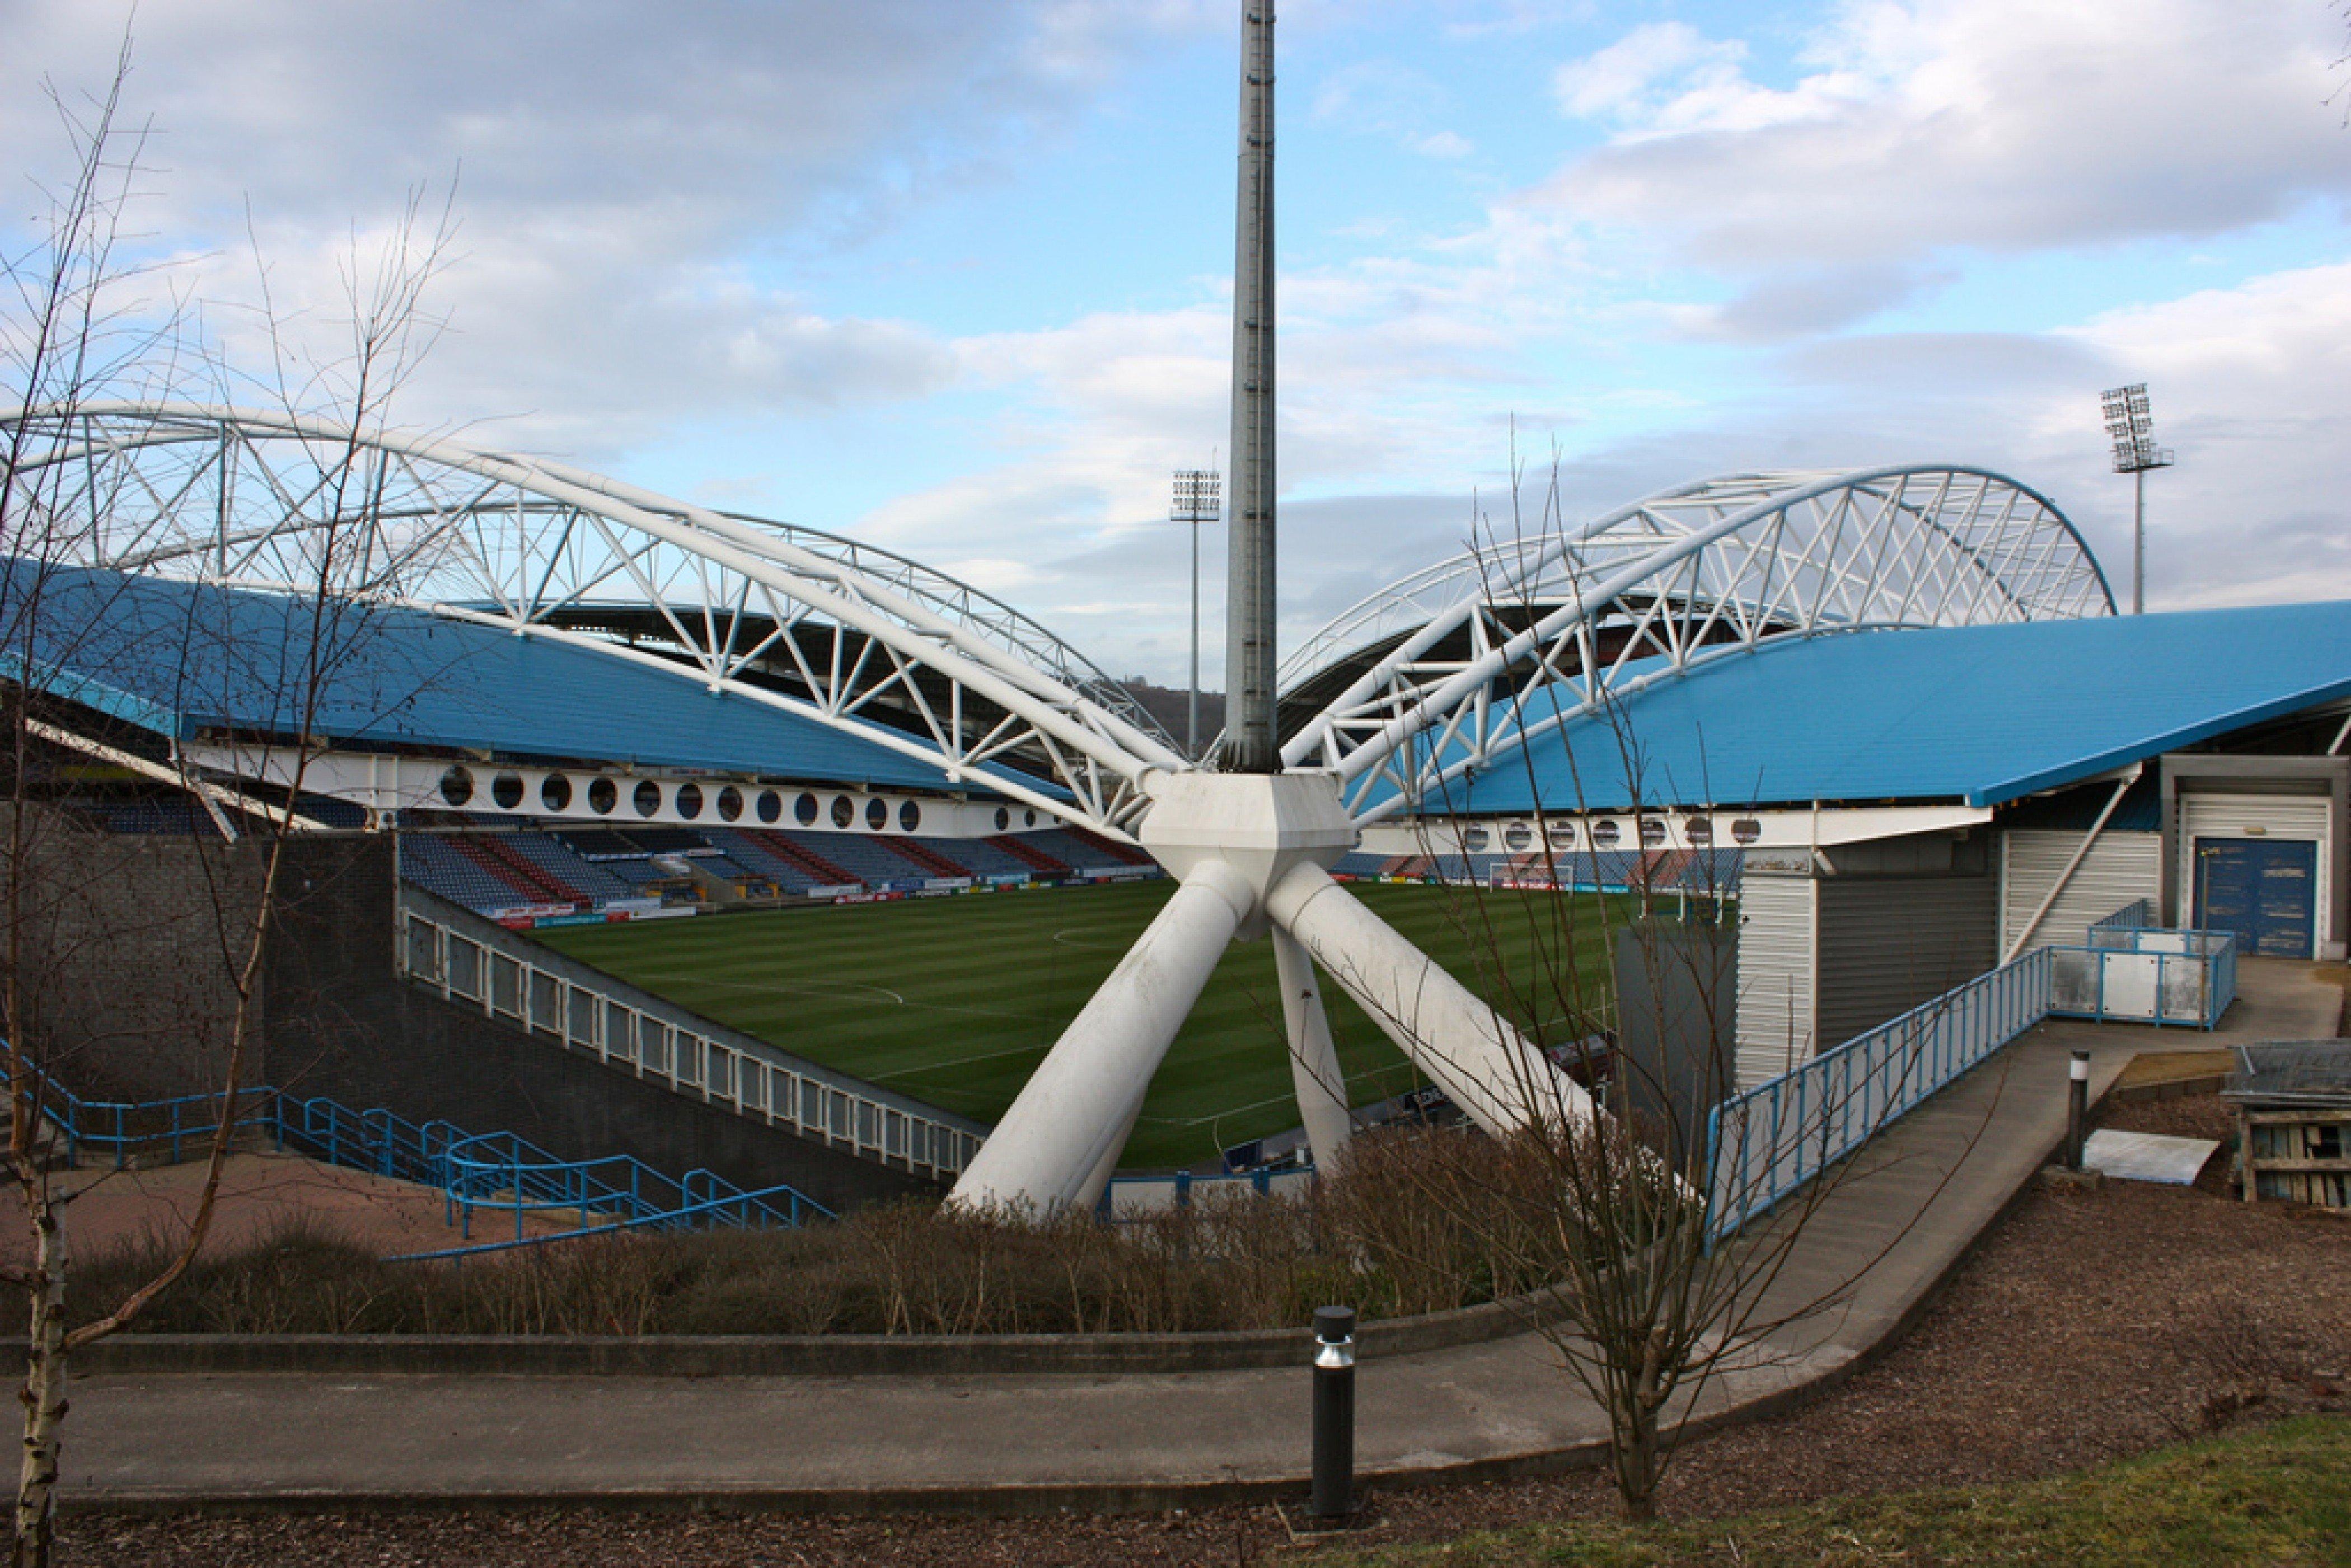 Huddersfield Town vs Crystal Palace Preview: Terriers seek first win after international break